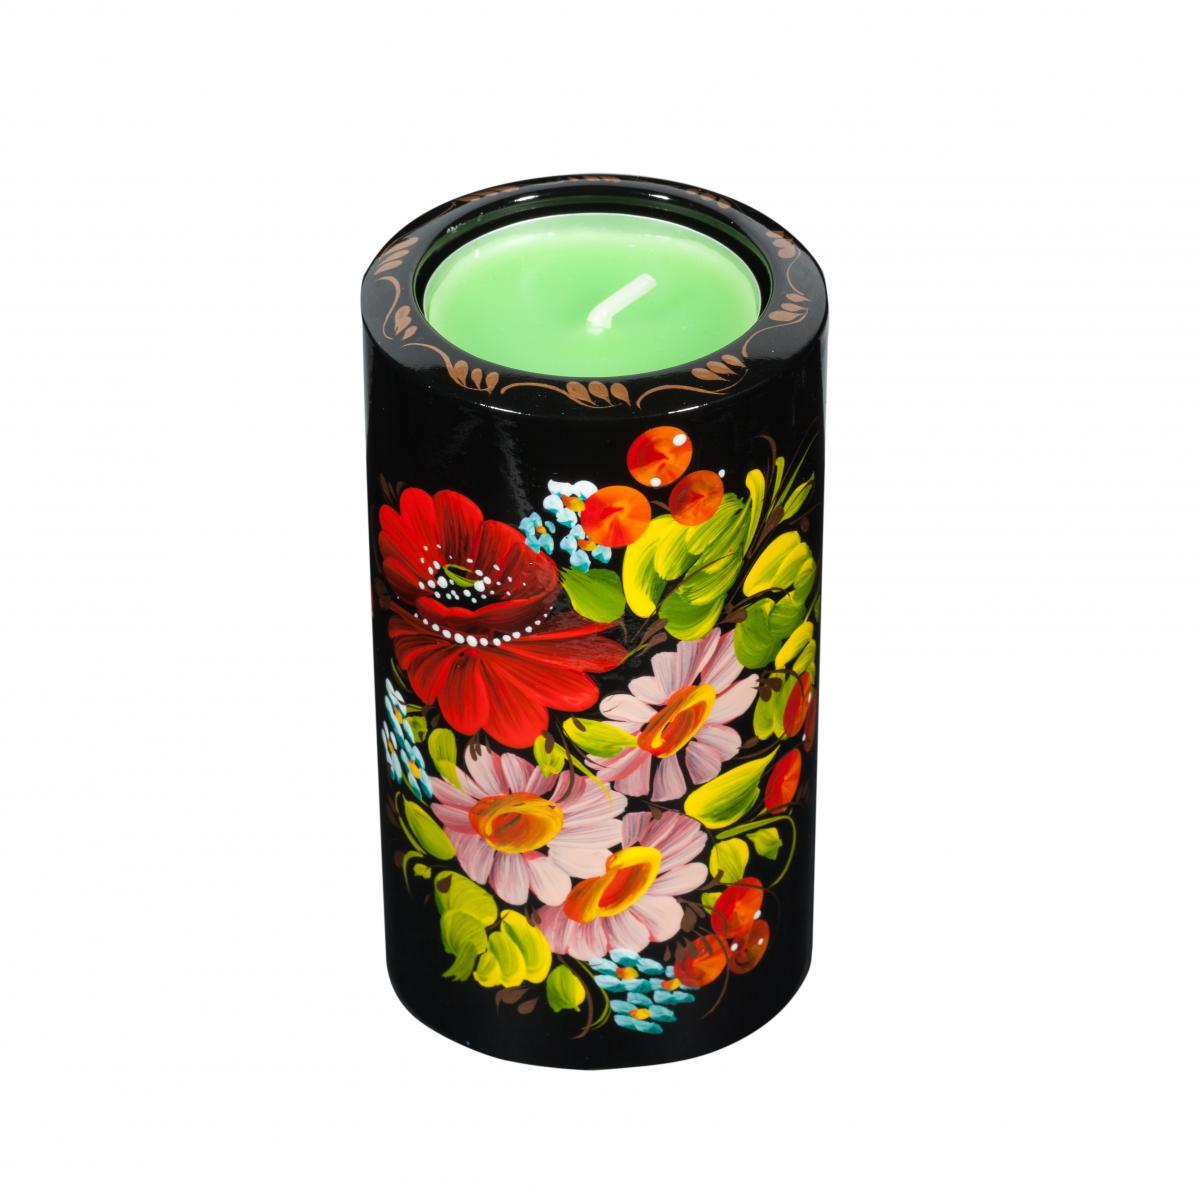 Candle tumbler with Petrikivskiy painting